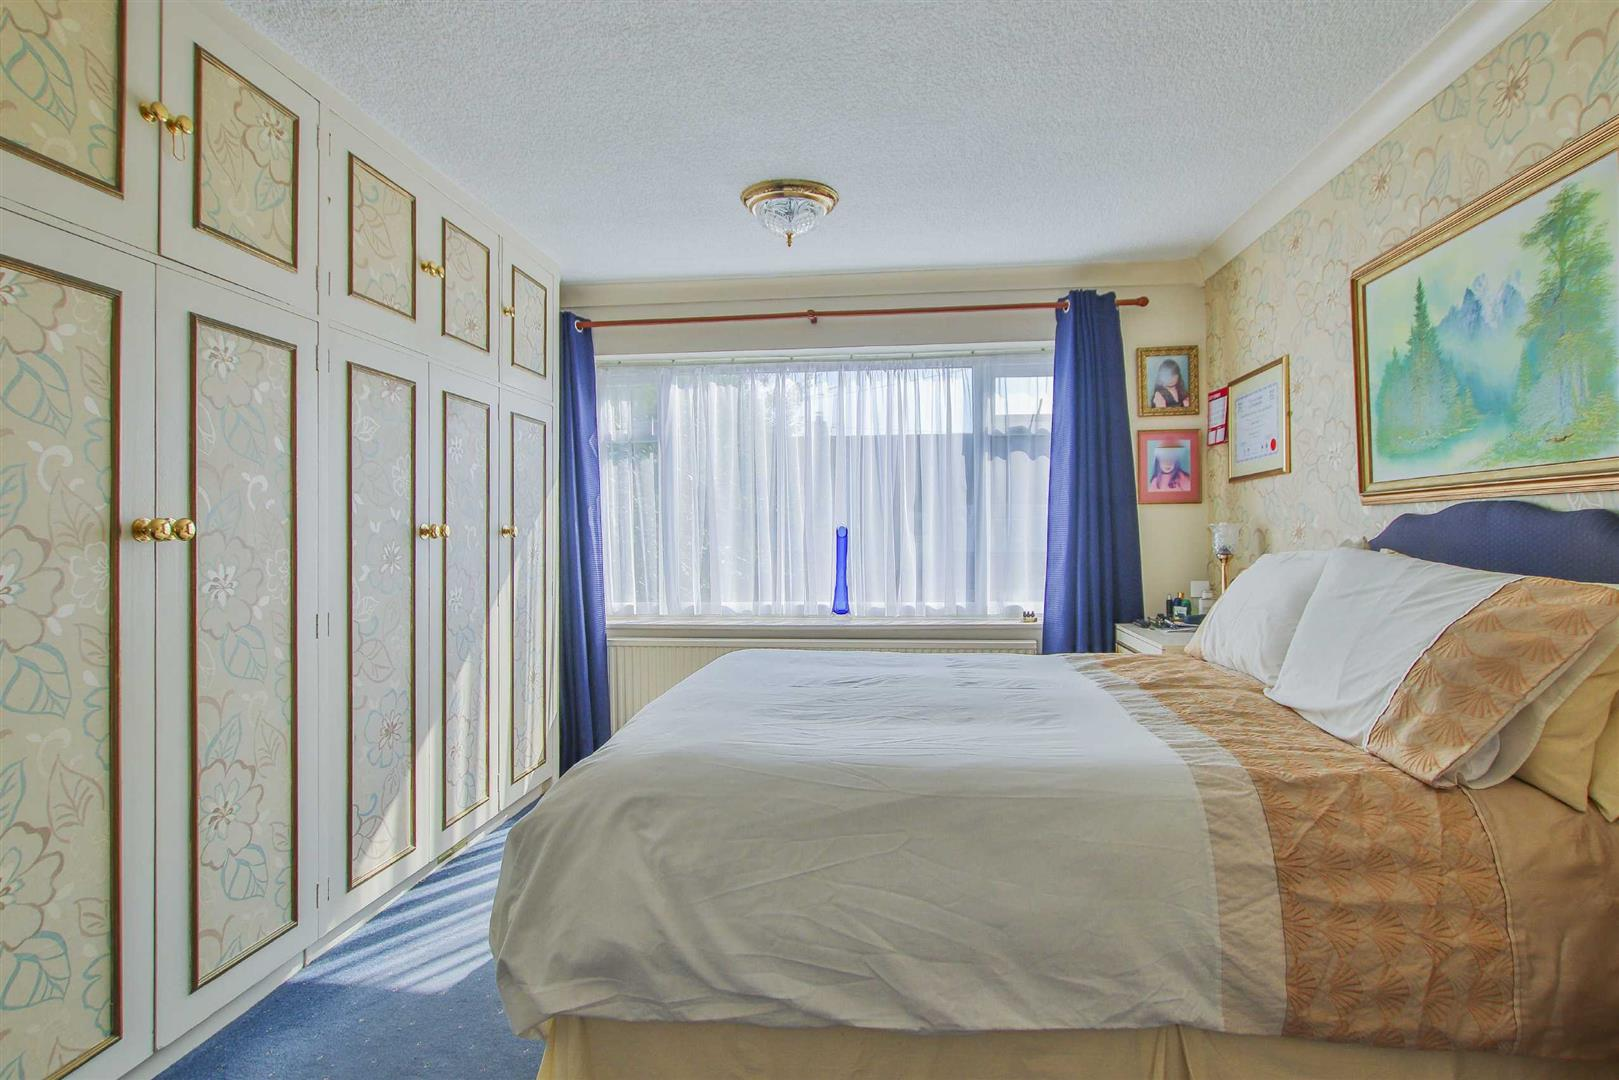 4 Bedroom Detached House For Sale - Image 13